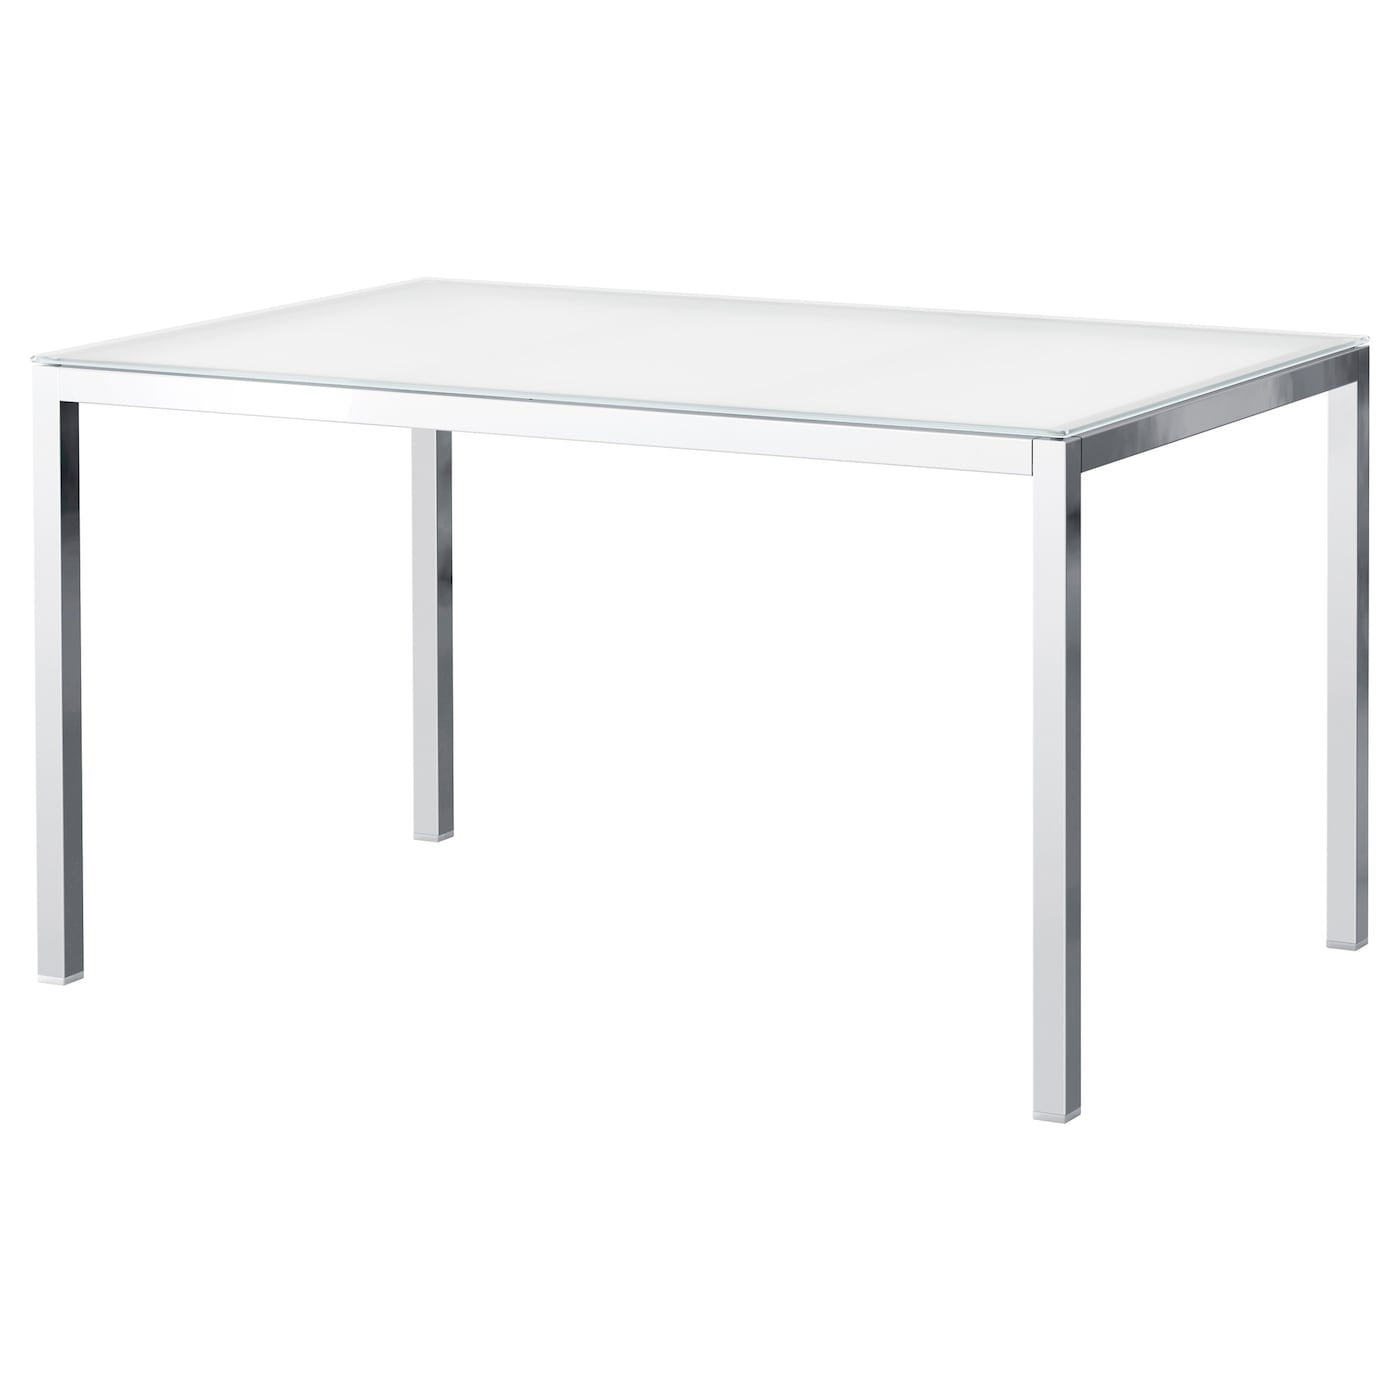 Superbe IKEA TORSBY Table Seats 4.